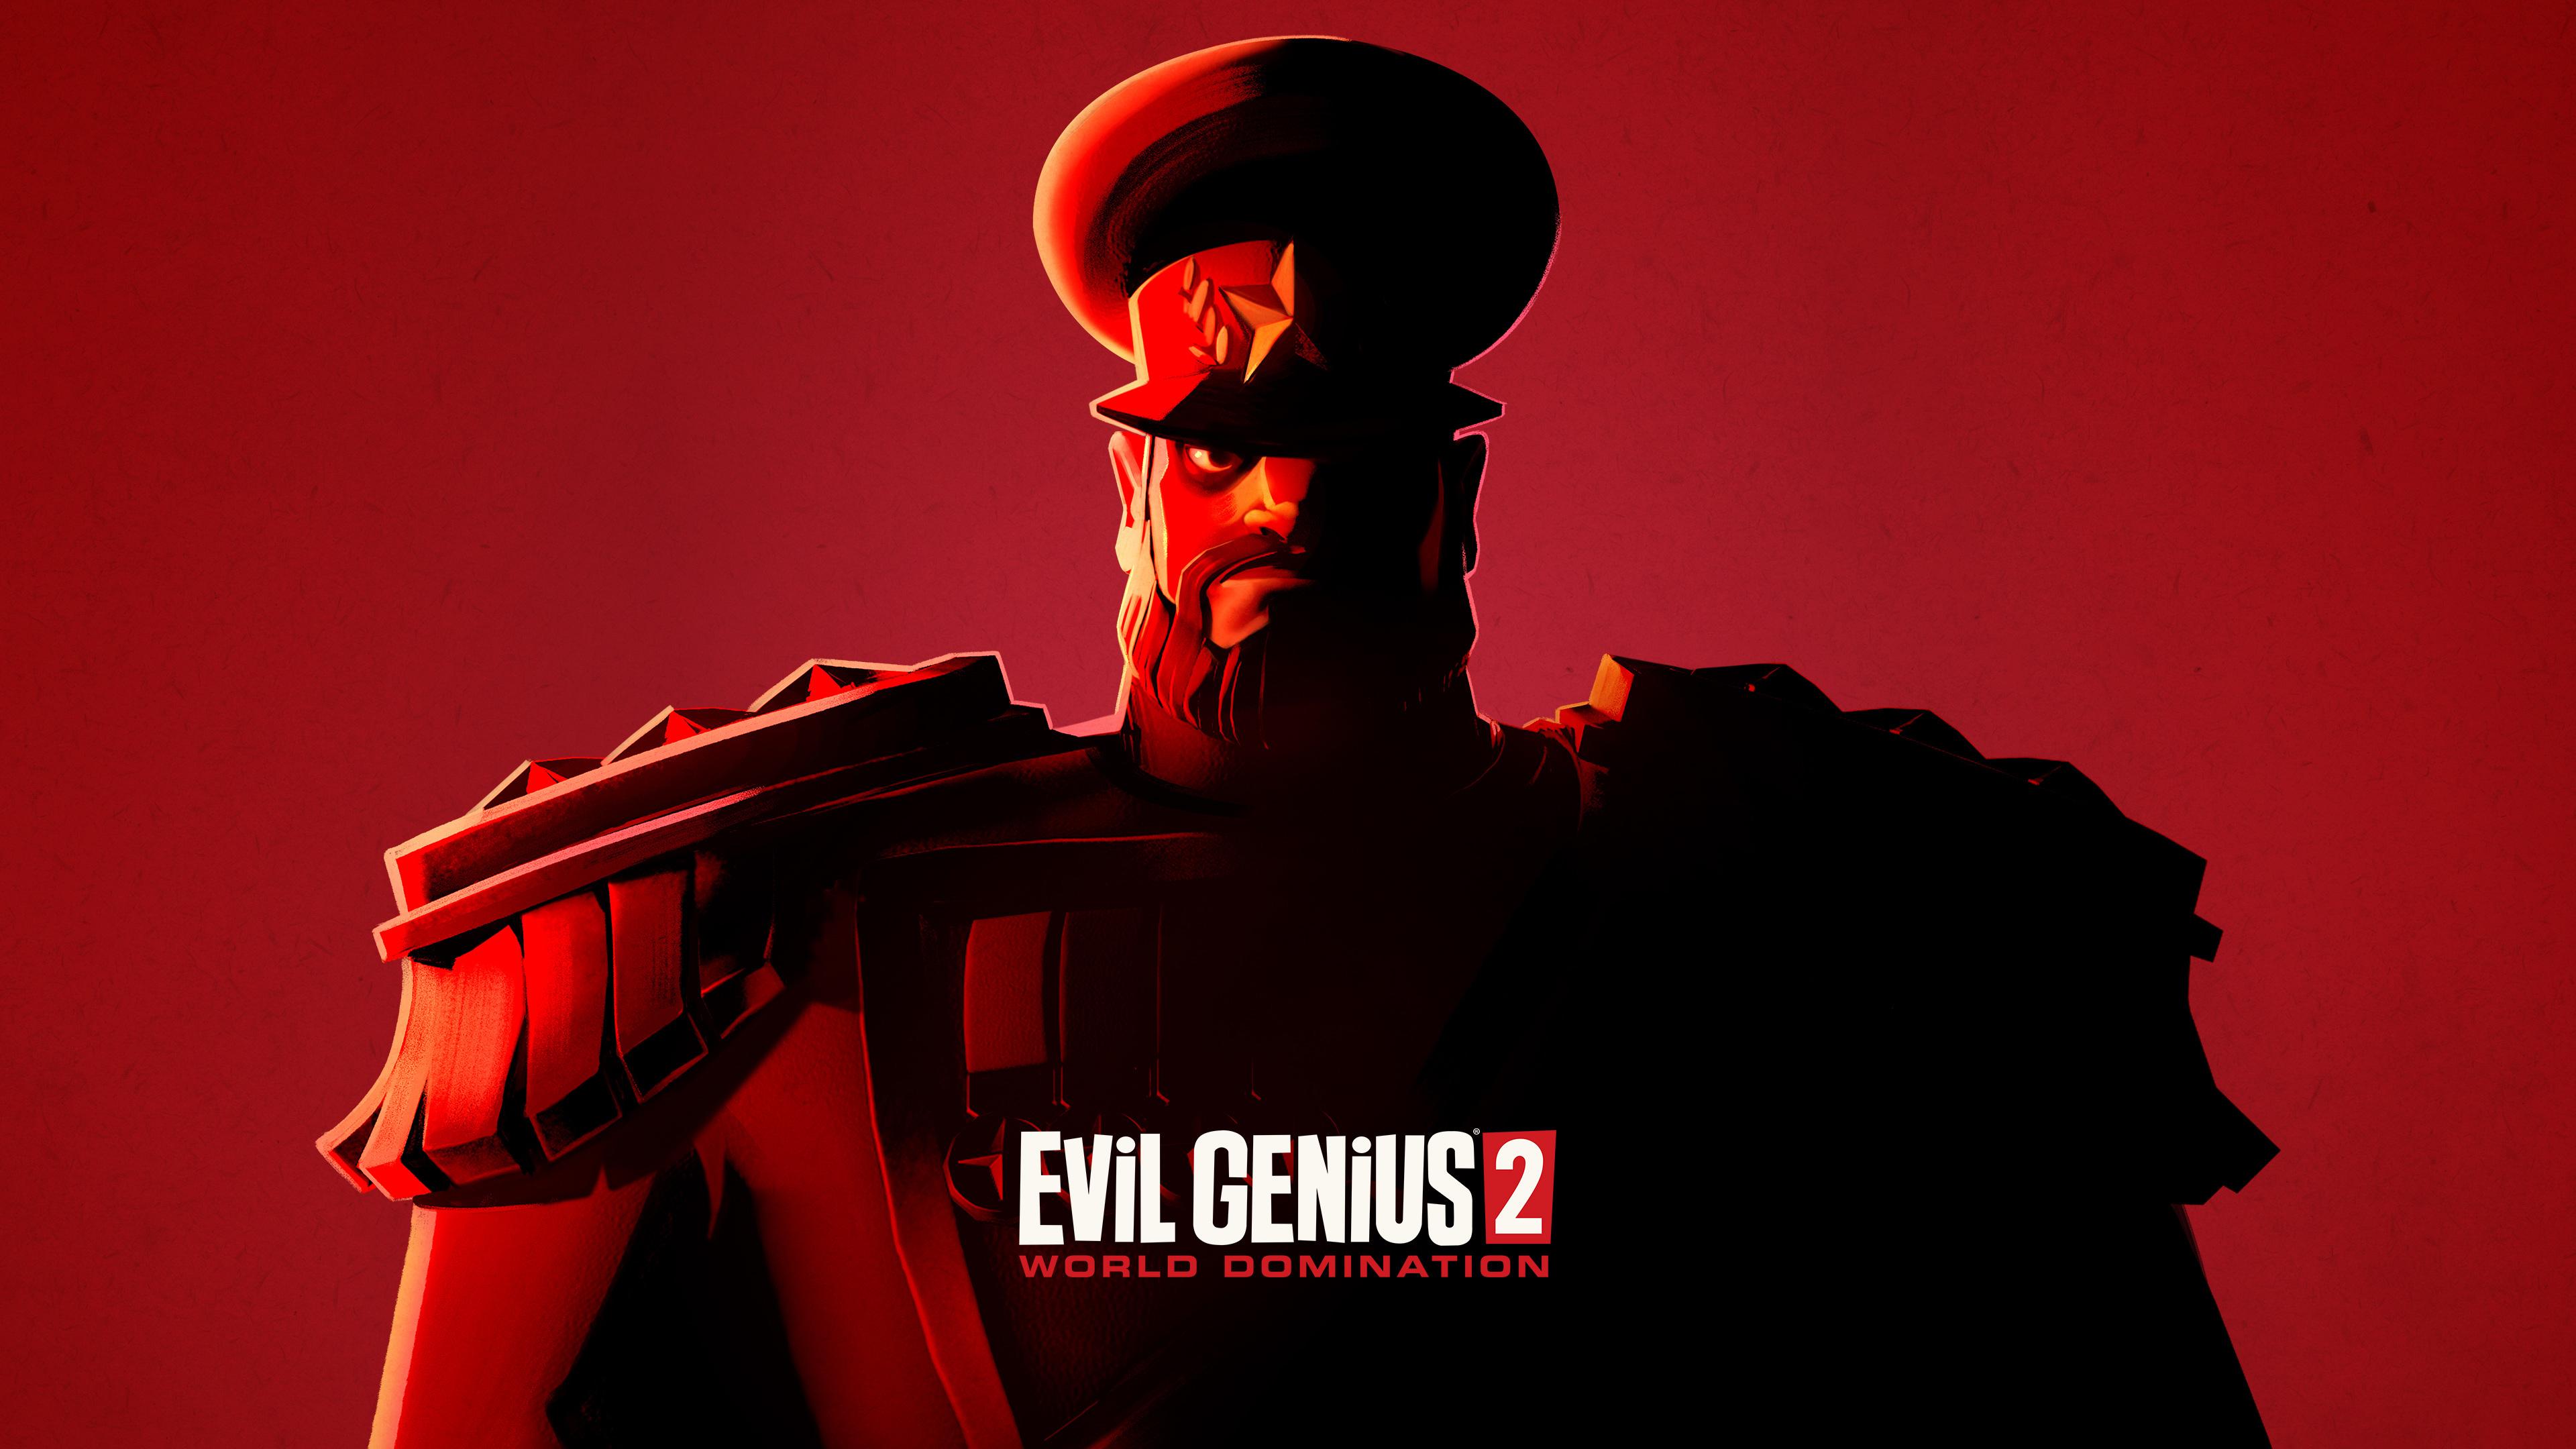 Evil Genius World Domination Wallpaper HD Games 4K Wallpapers 3840x2160